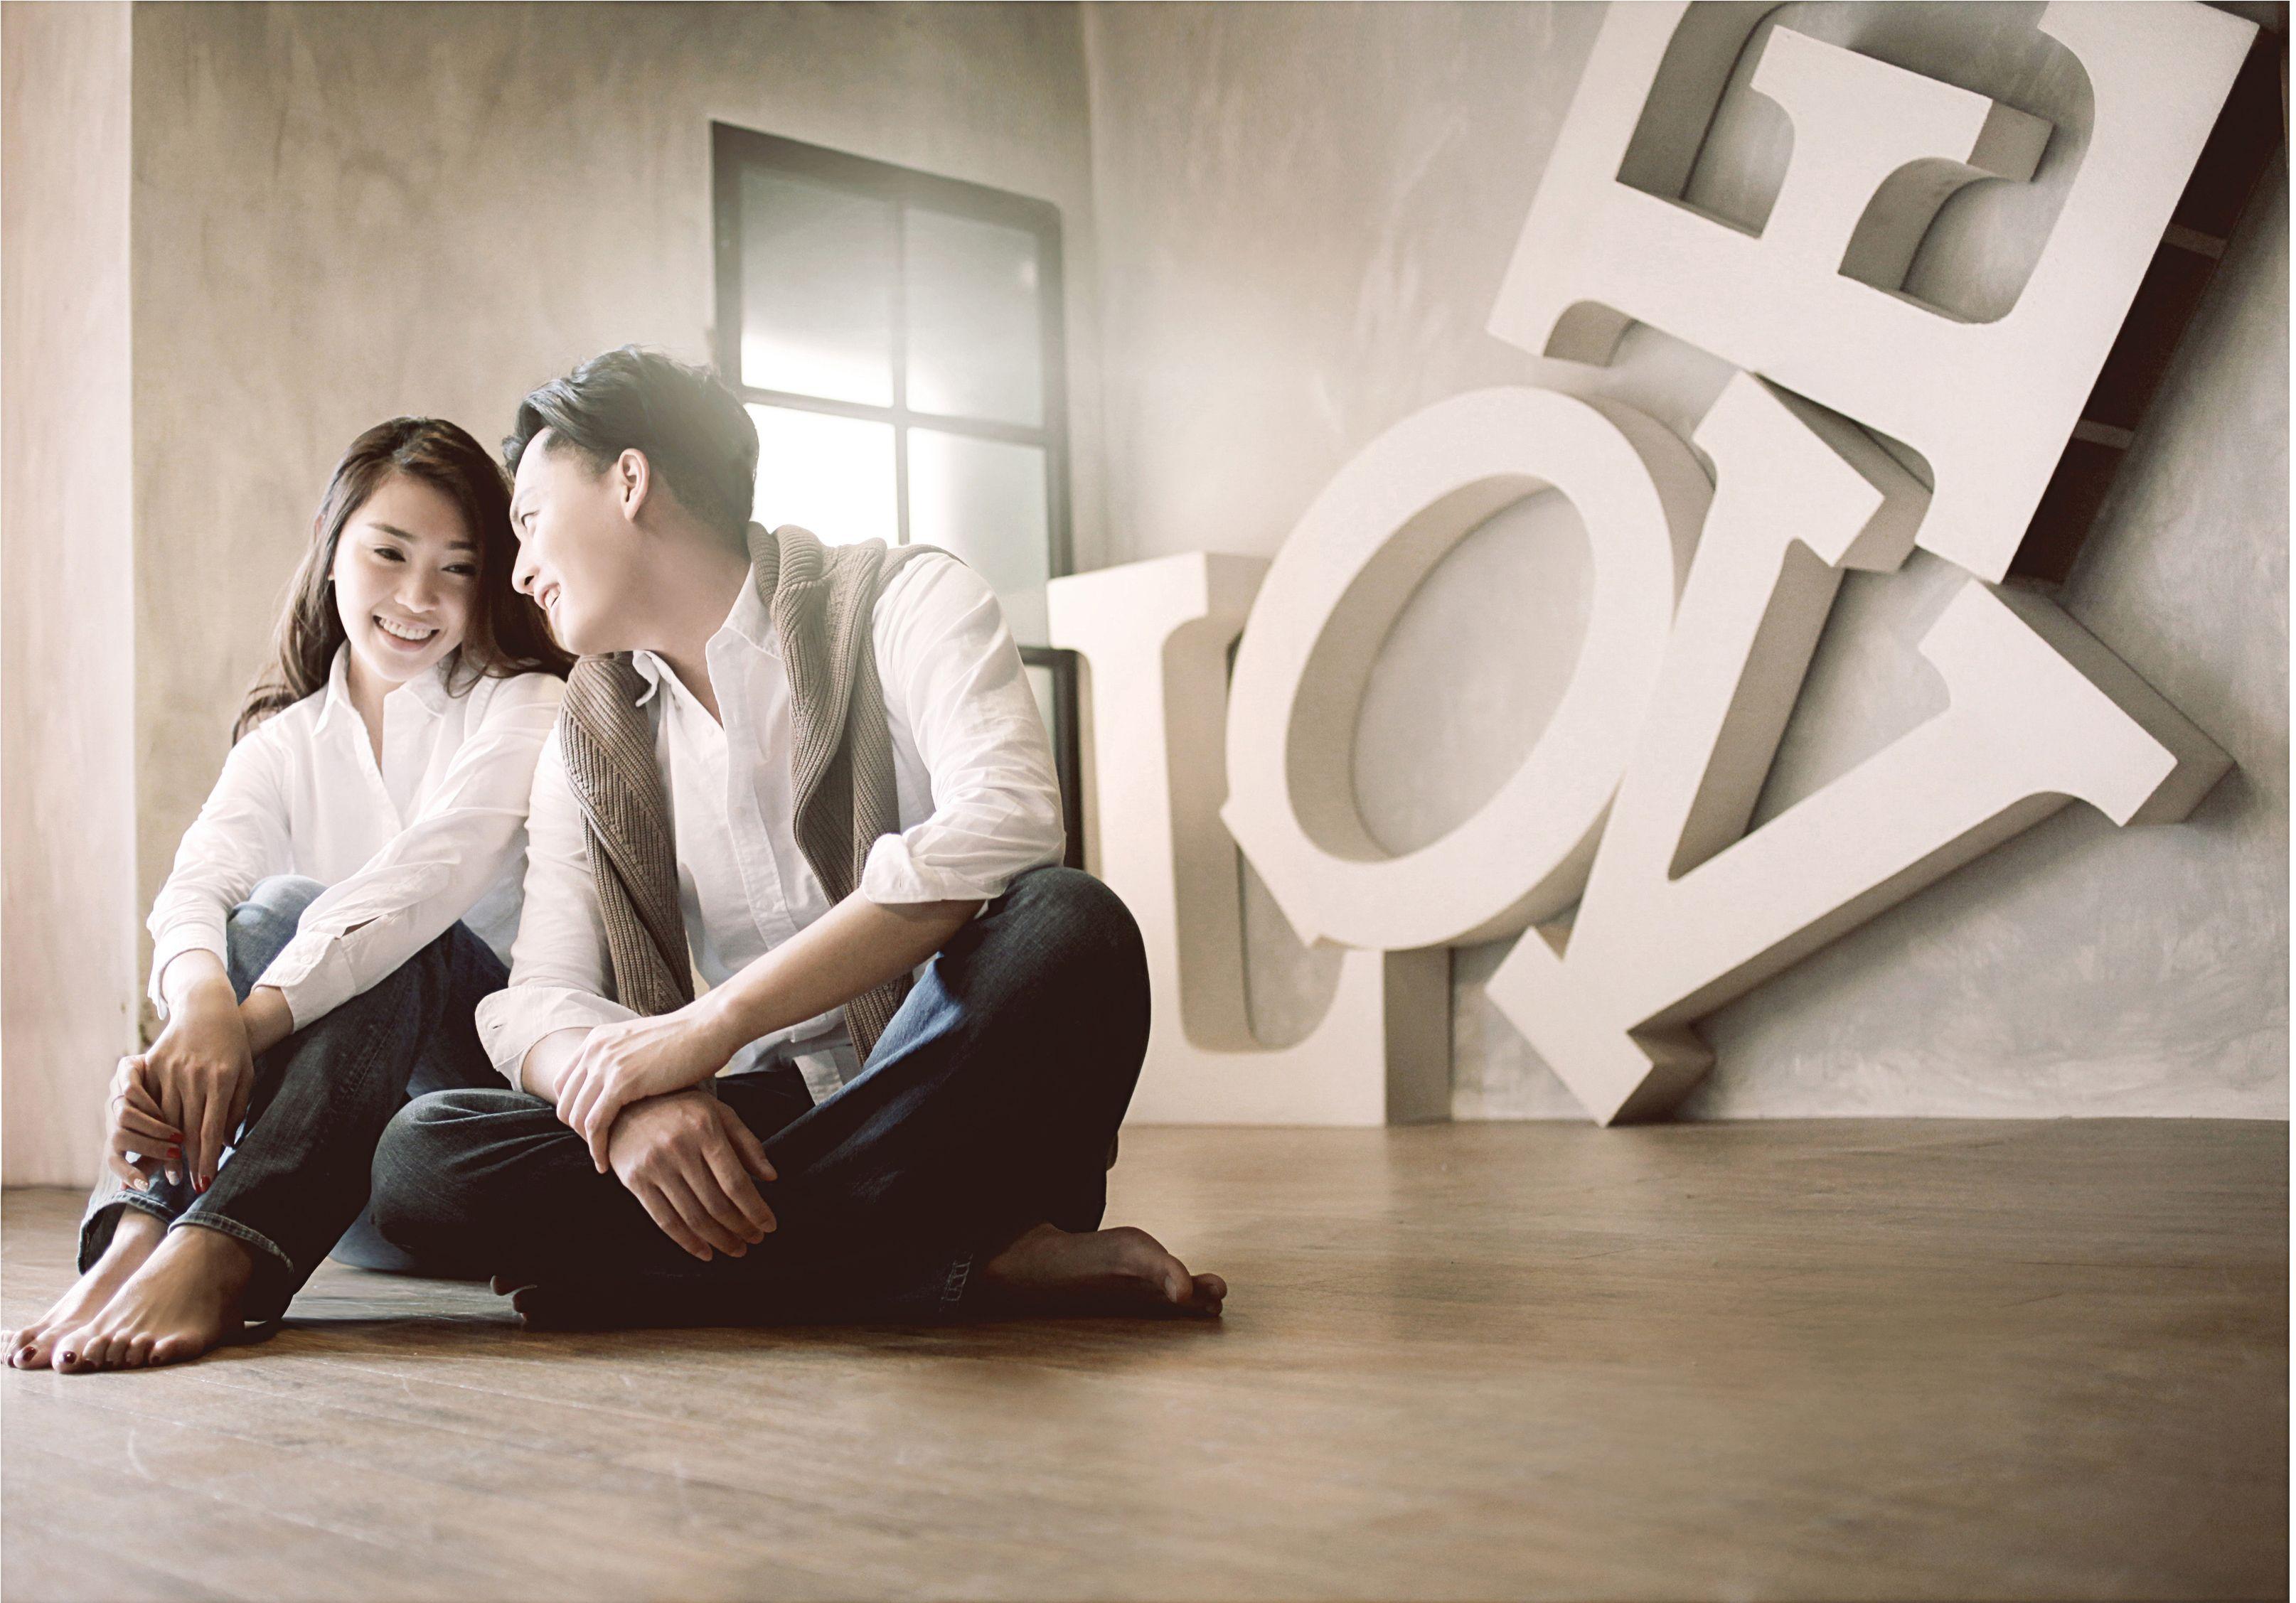 Chris Ling - Pre-Wedding Shoot - Studio Moments. #chrisling #prewedding #preweddingshoot #studio #moments #photography